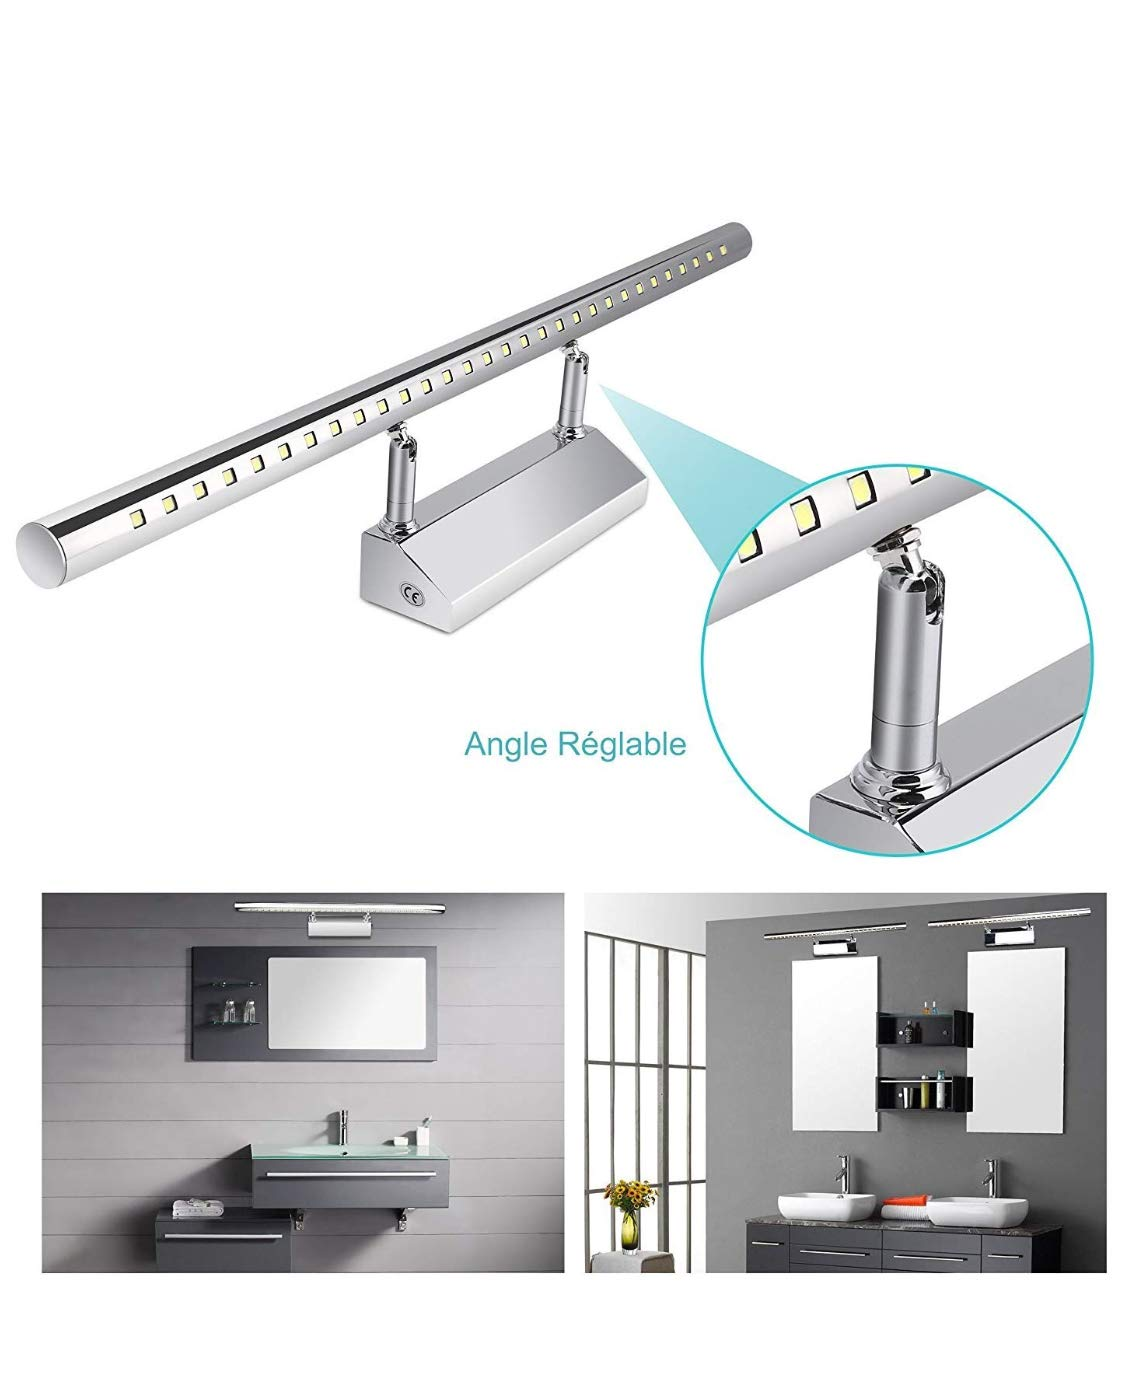 (LA) Aplique baño cromado 70cm LED 220V color blanco frio 6500K (70cm) [Clase de eficiencia energética A++] Led Atomant